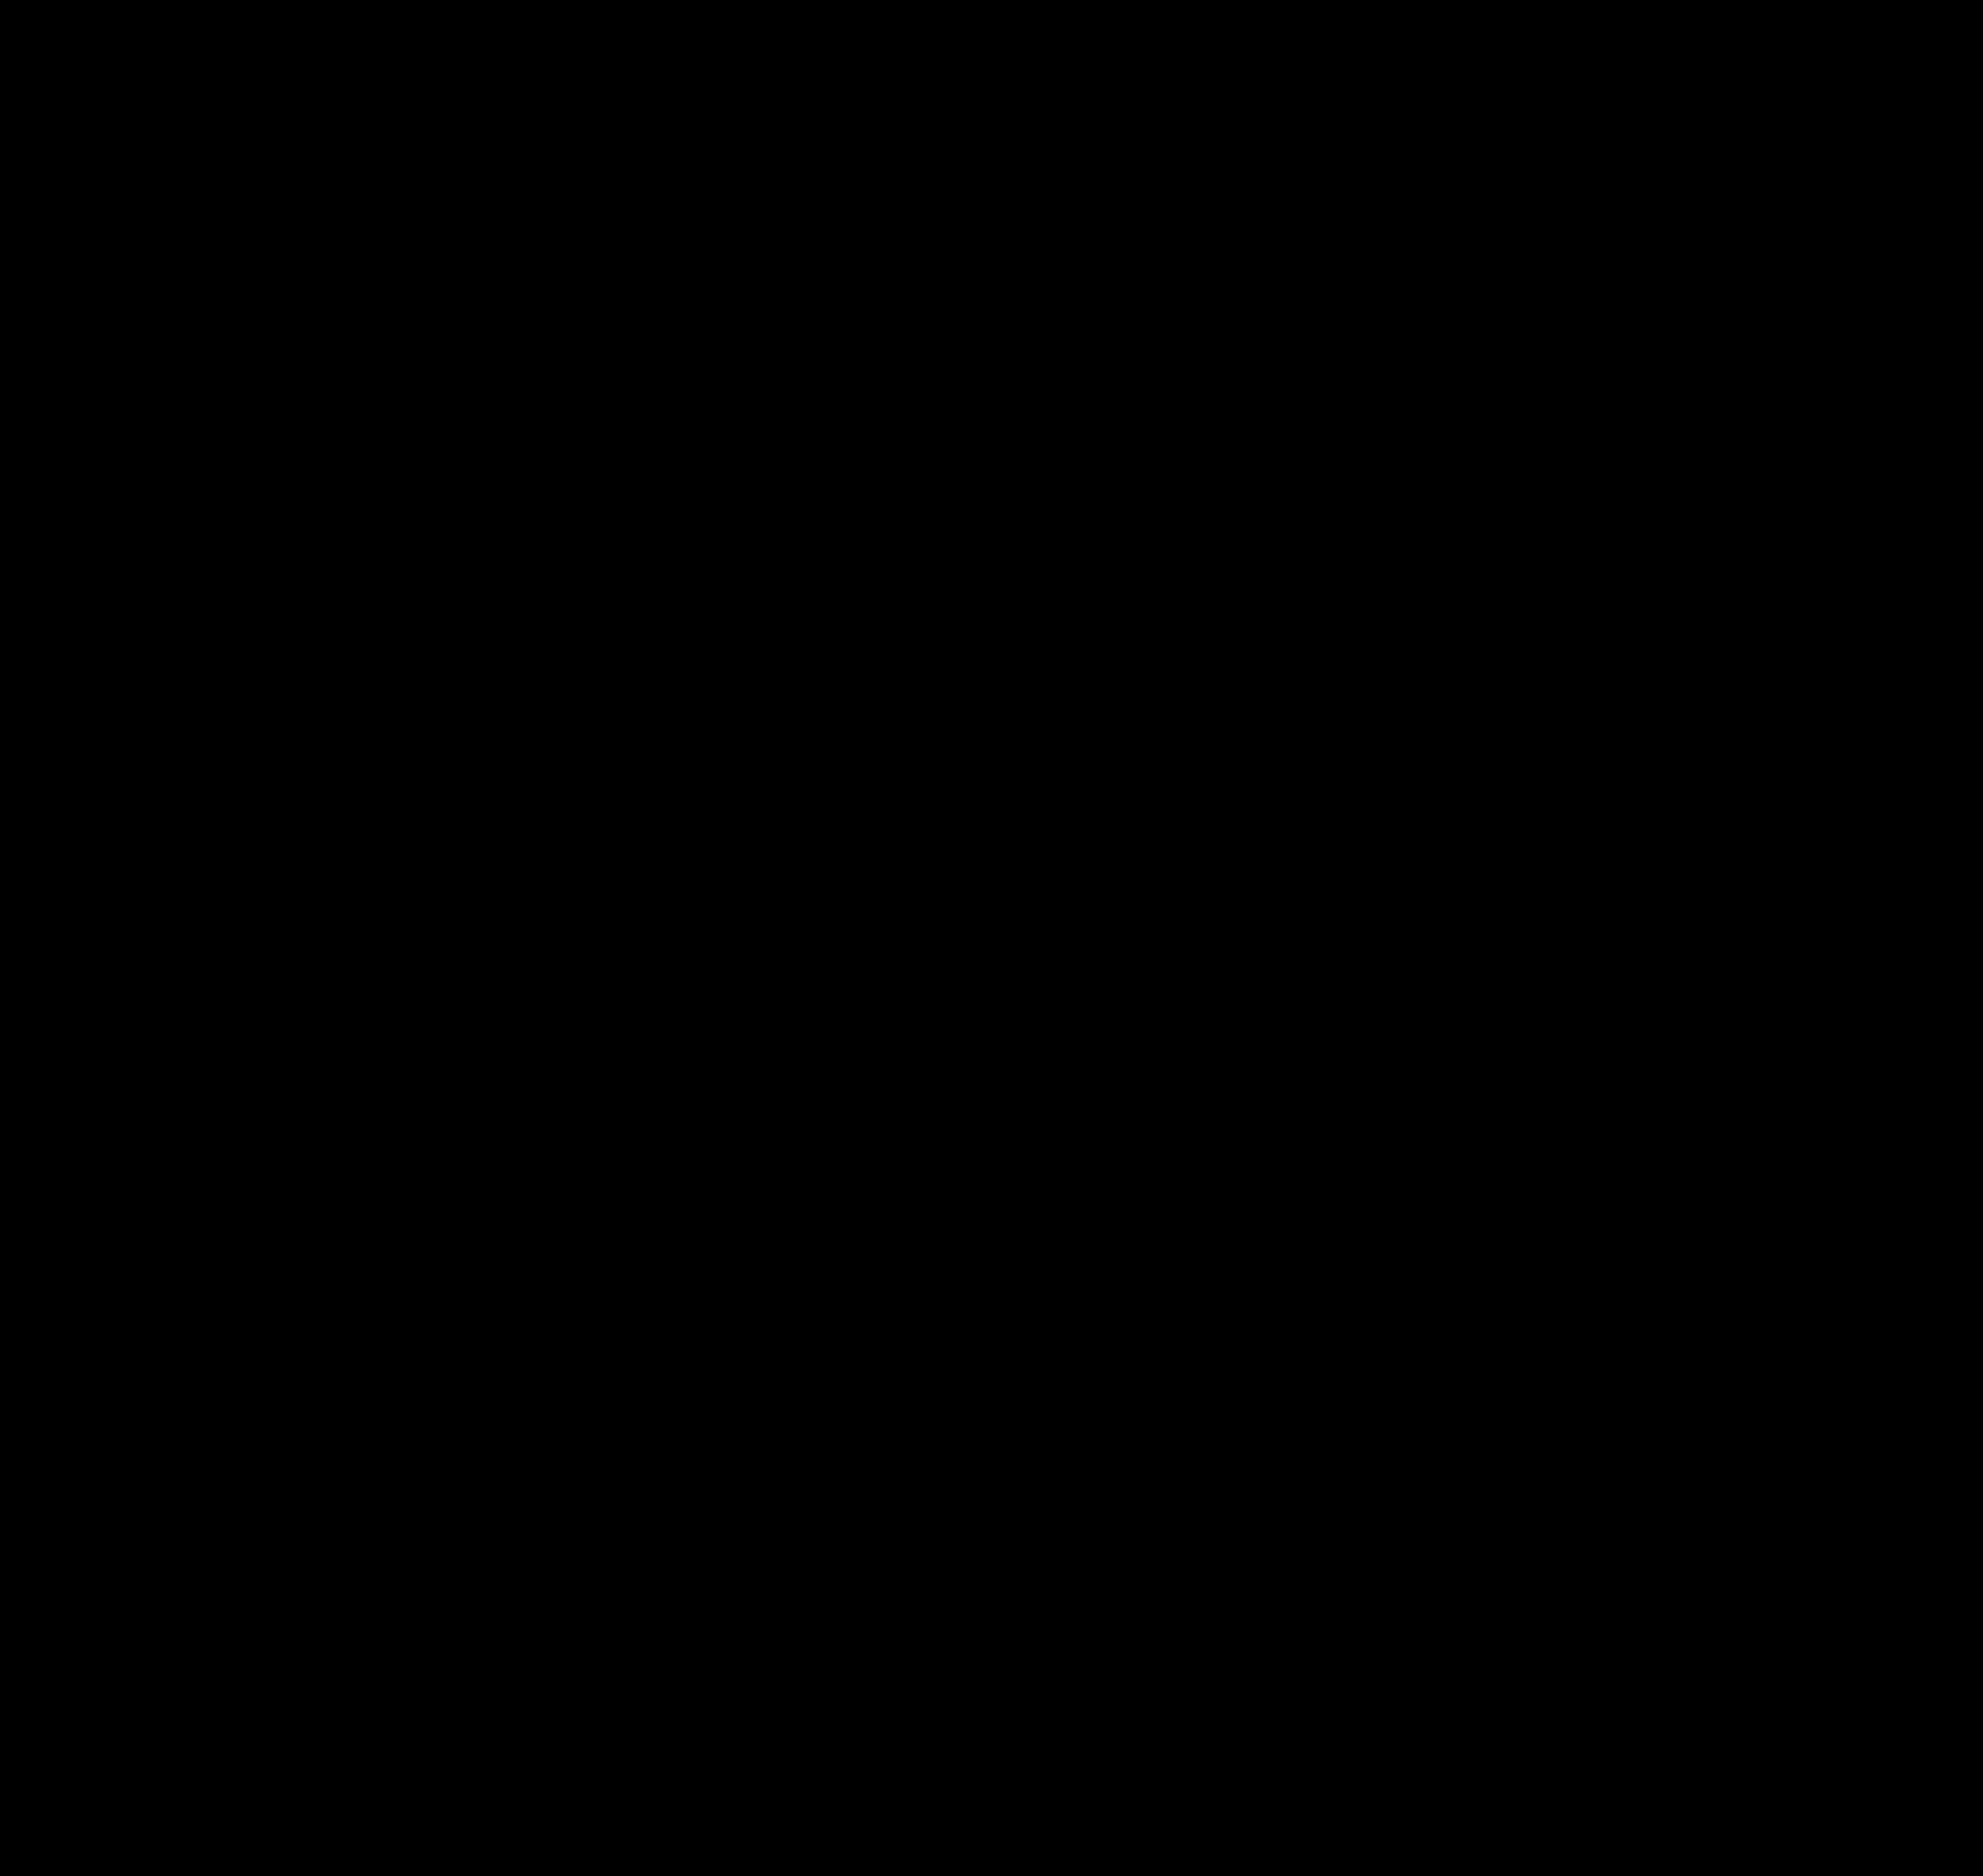 logo-black (9).png